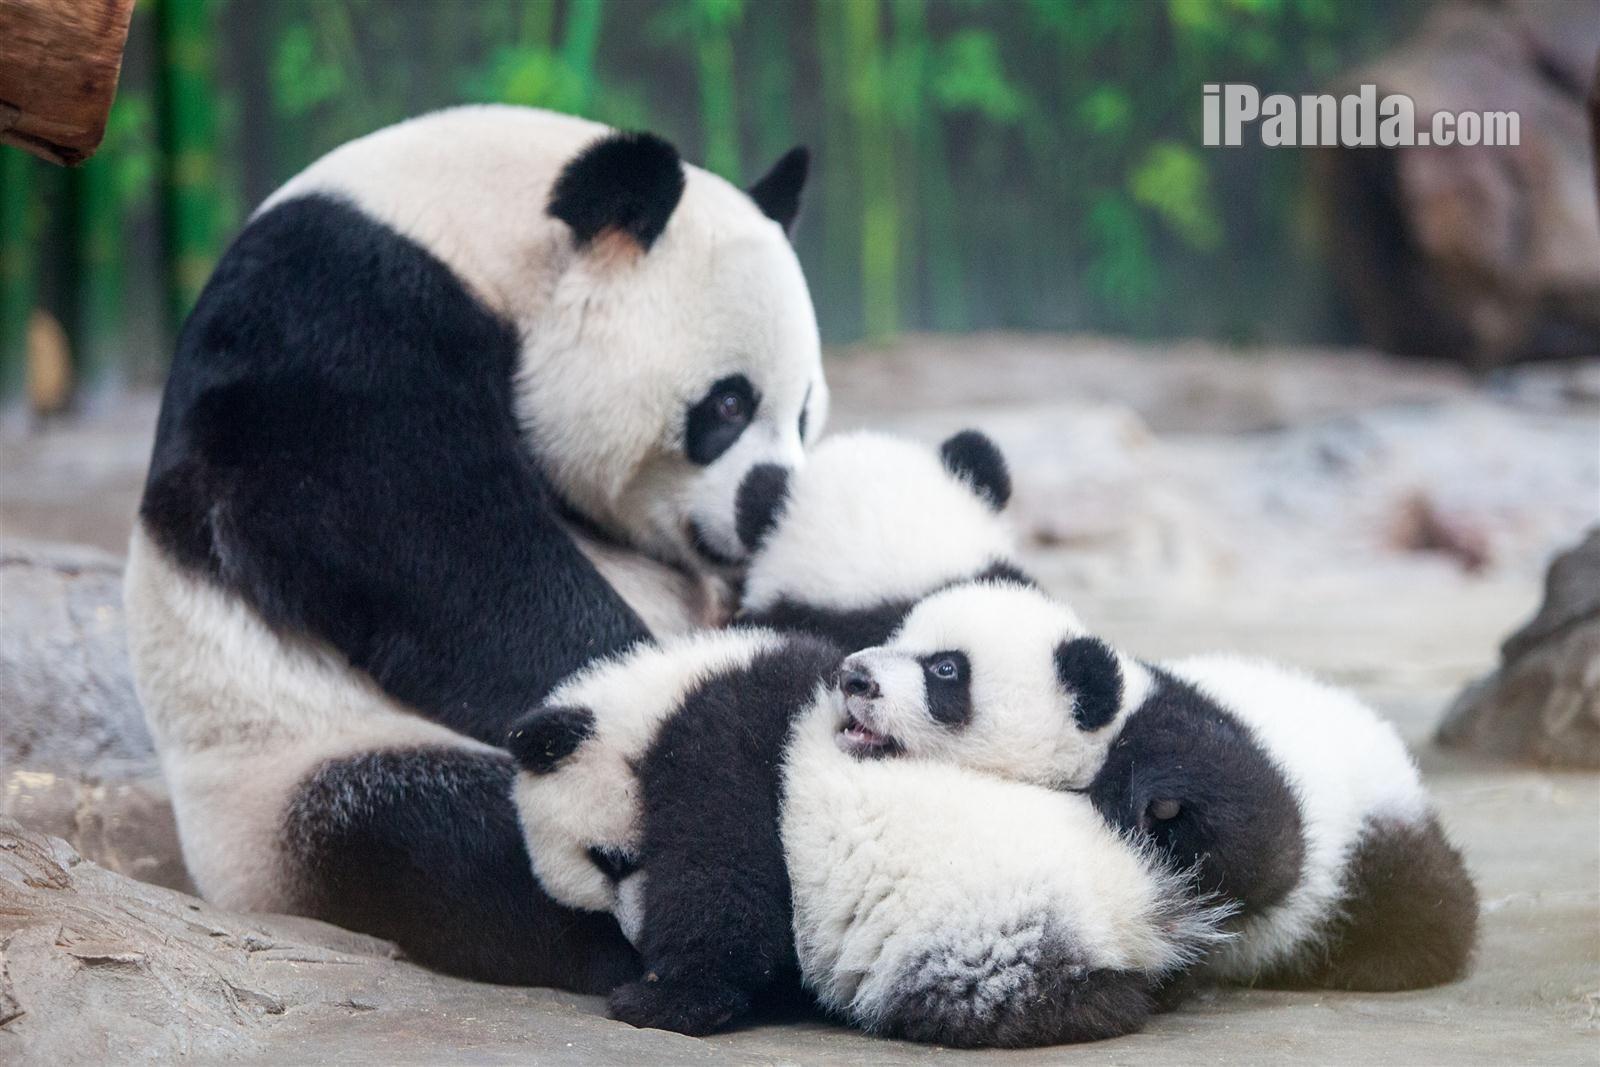 Panda triplets grow diary (five): reunion - iPanda.com